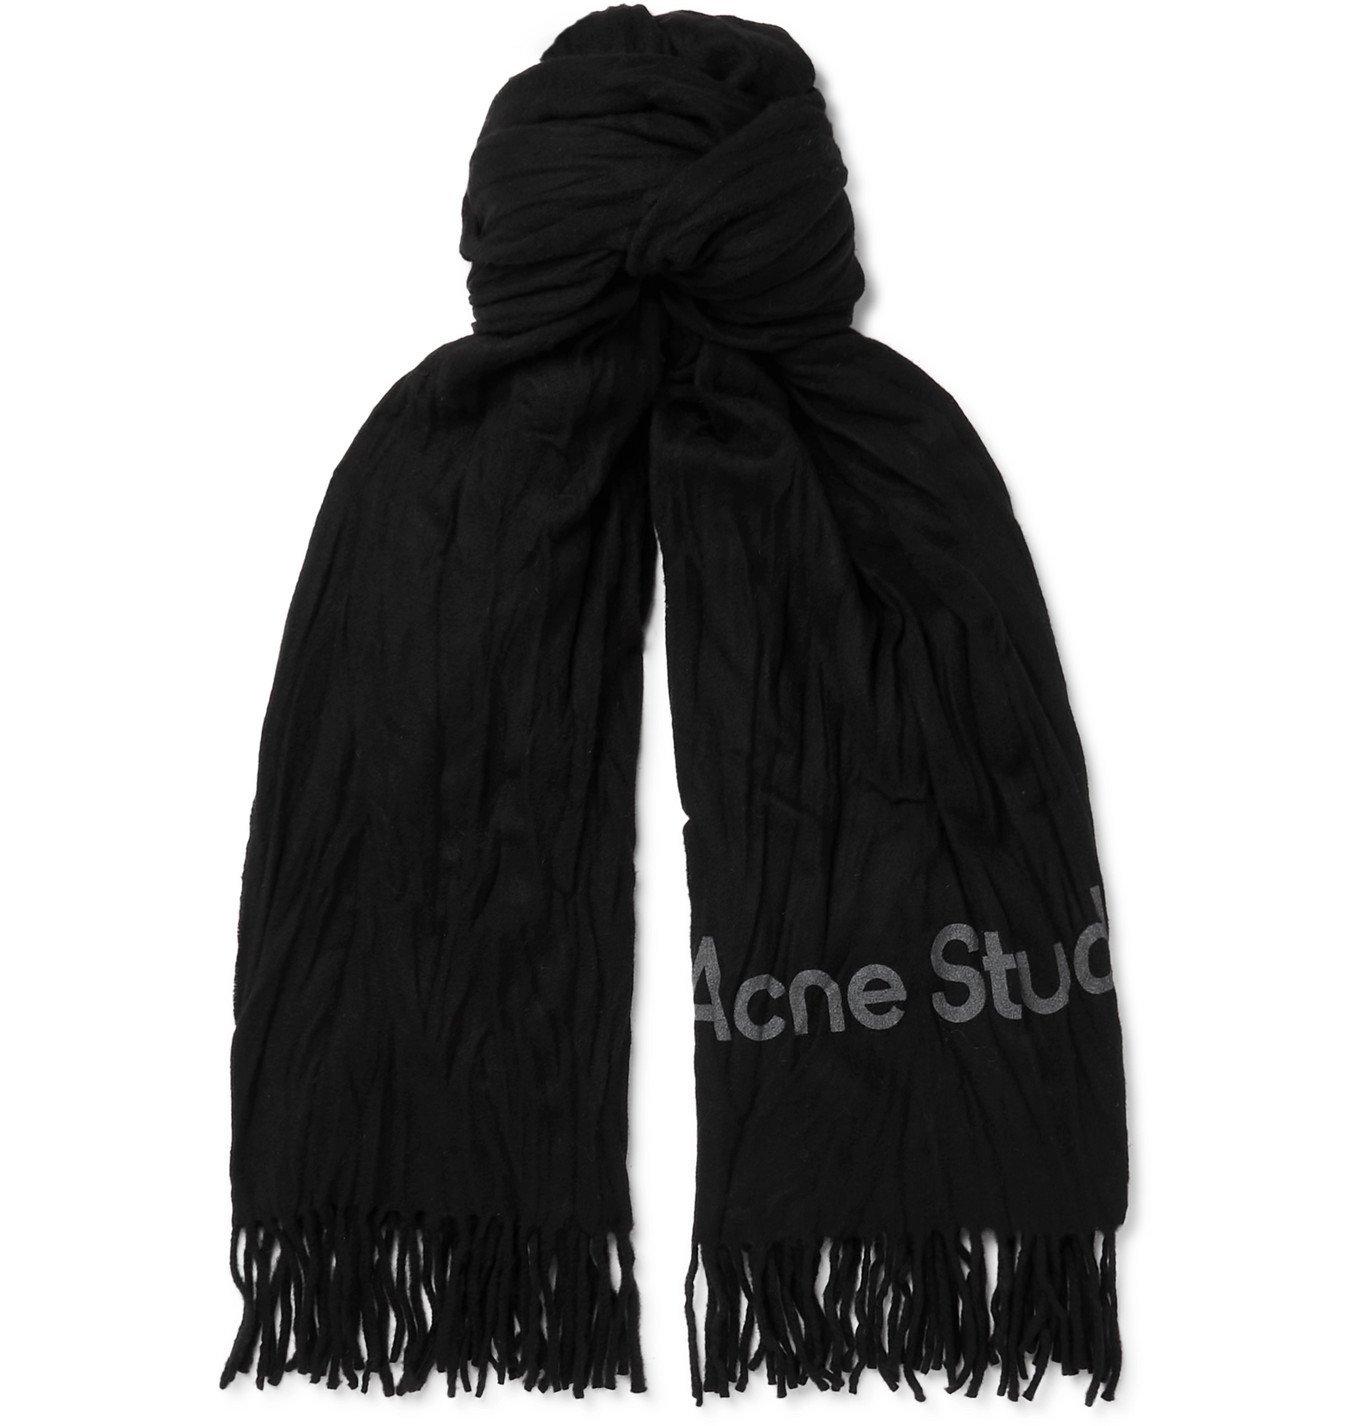 ACNE STUDIOS - Logo-Print Fringed Crinkled-Wool Scarf - Black